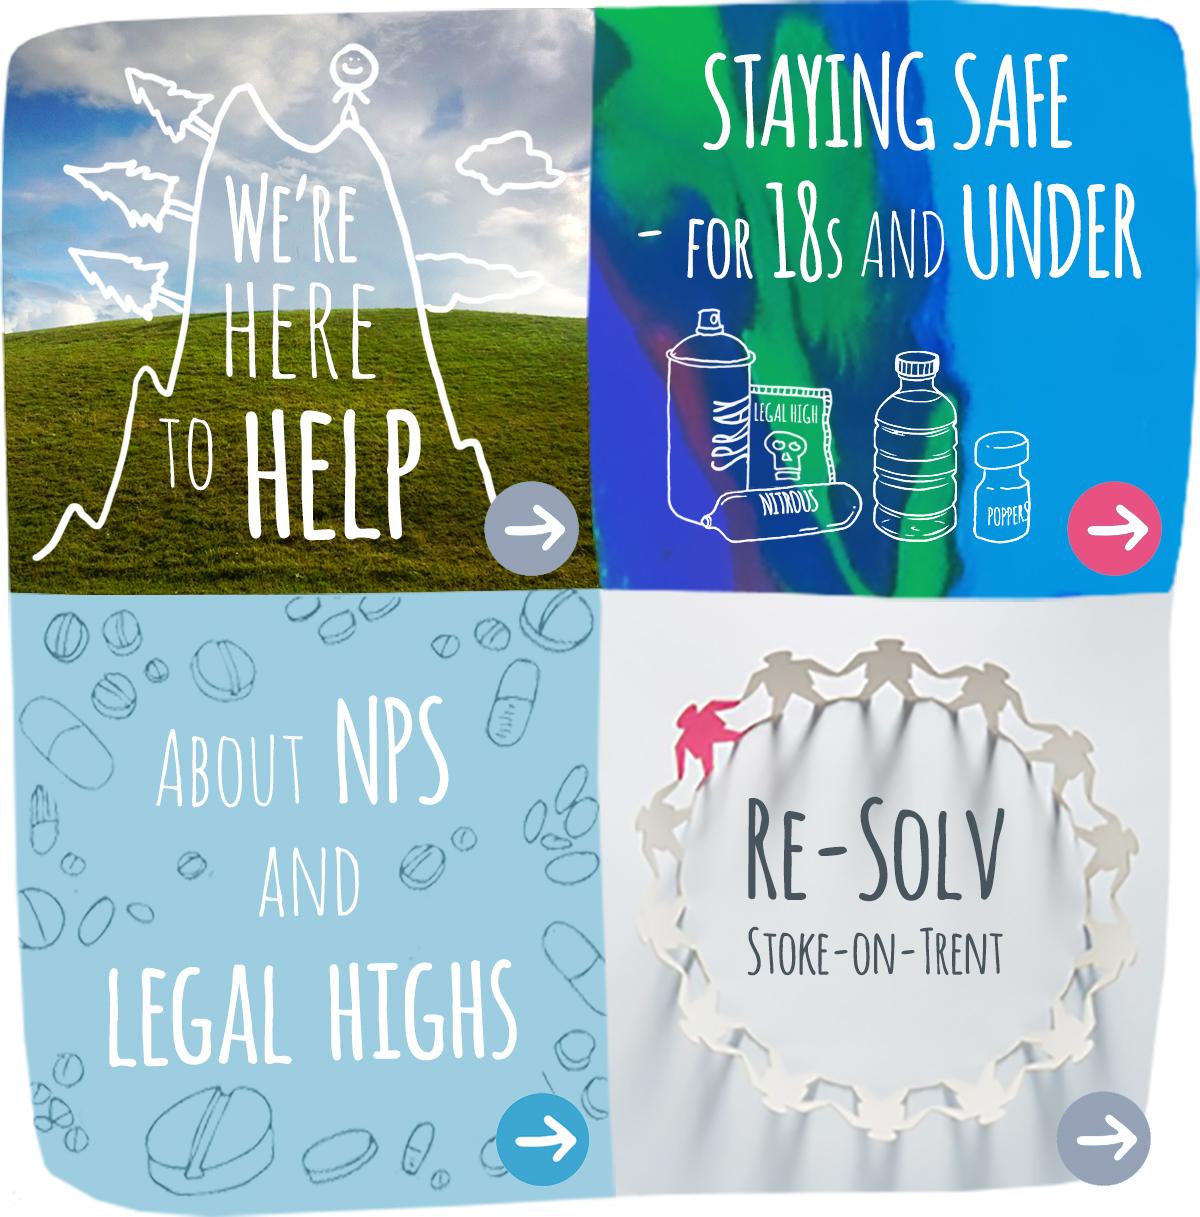 re-solv legal high help